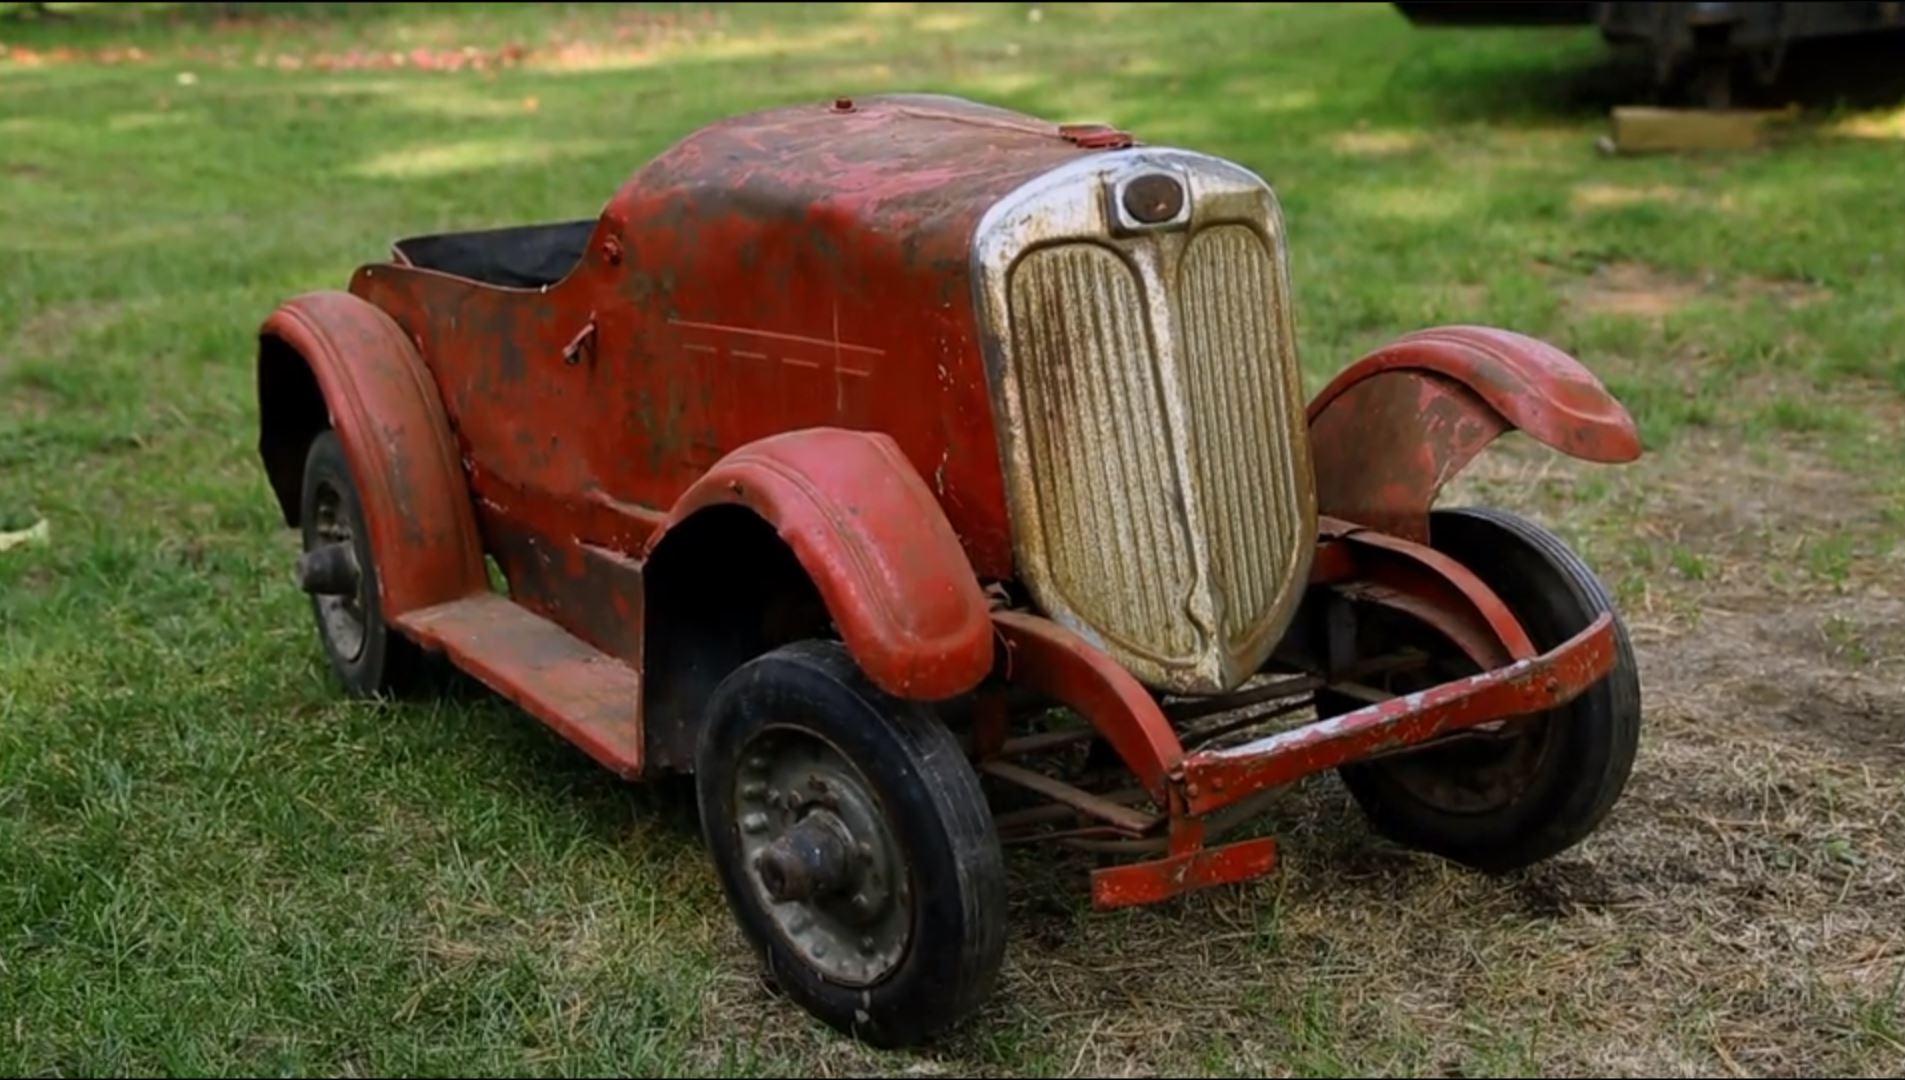 1936 Packard pedal car/carnival ride